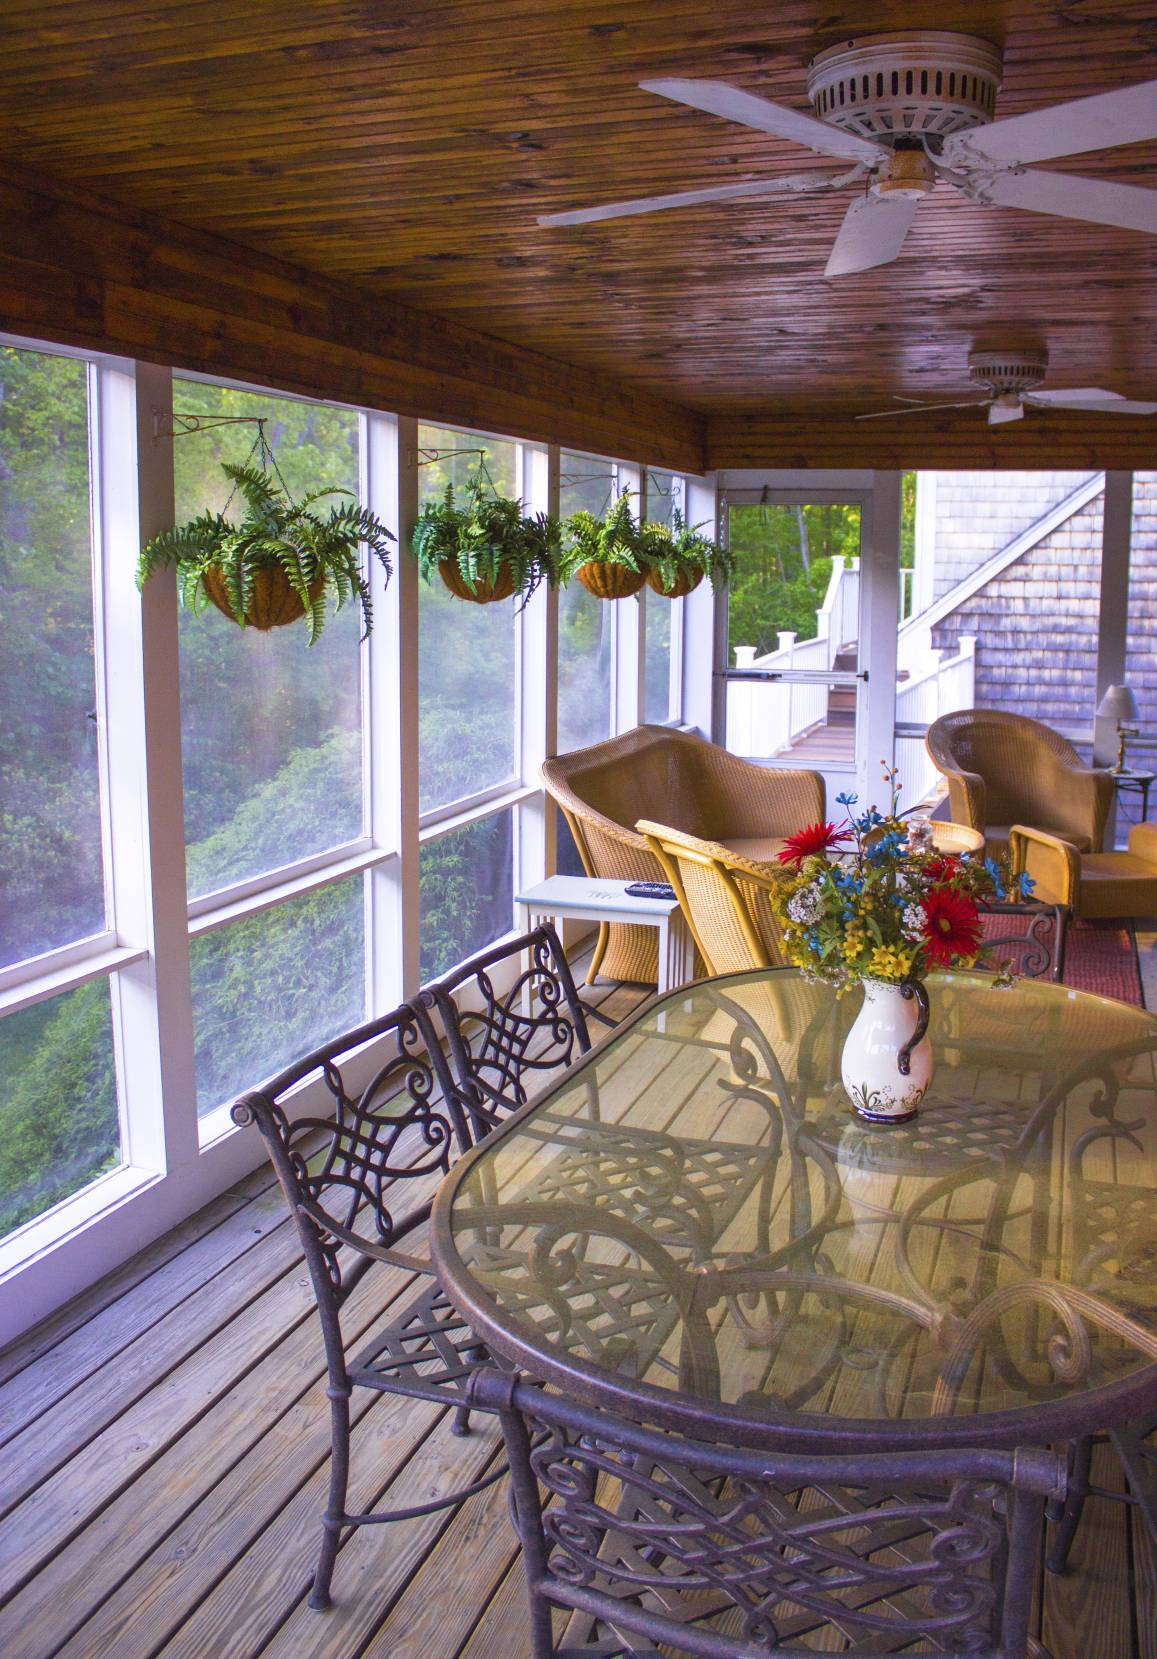 installer une veranda pour agrandir maison